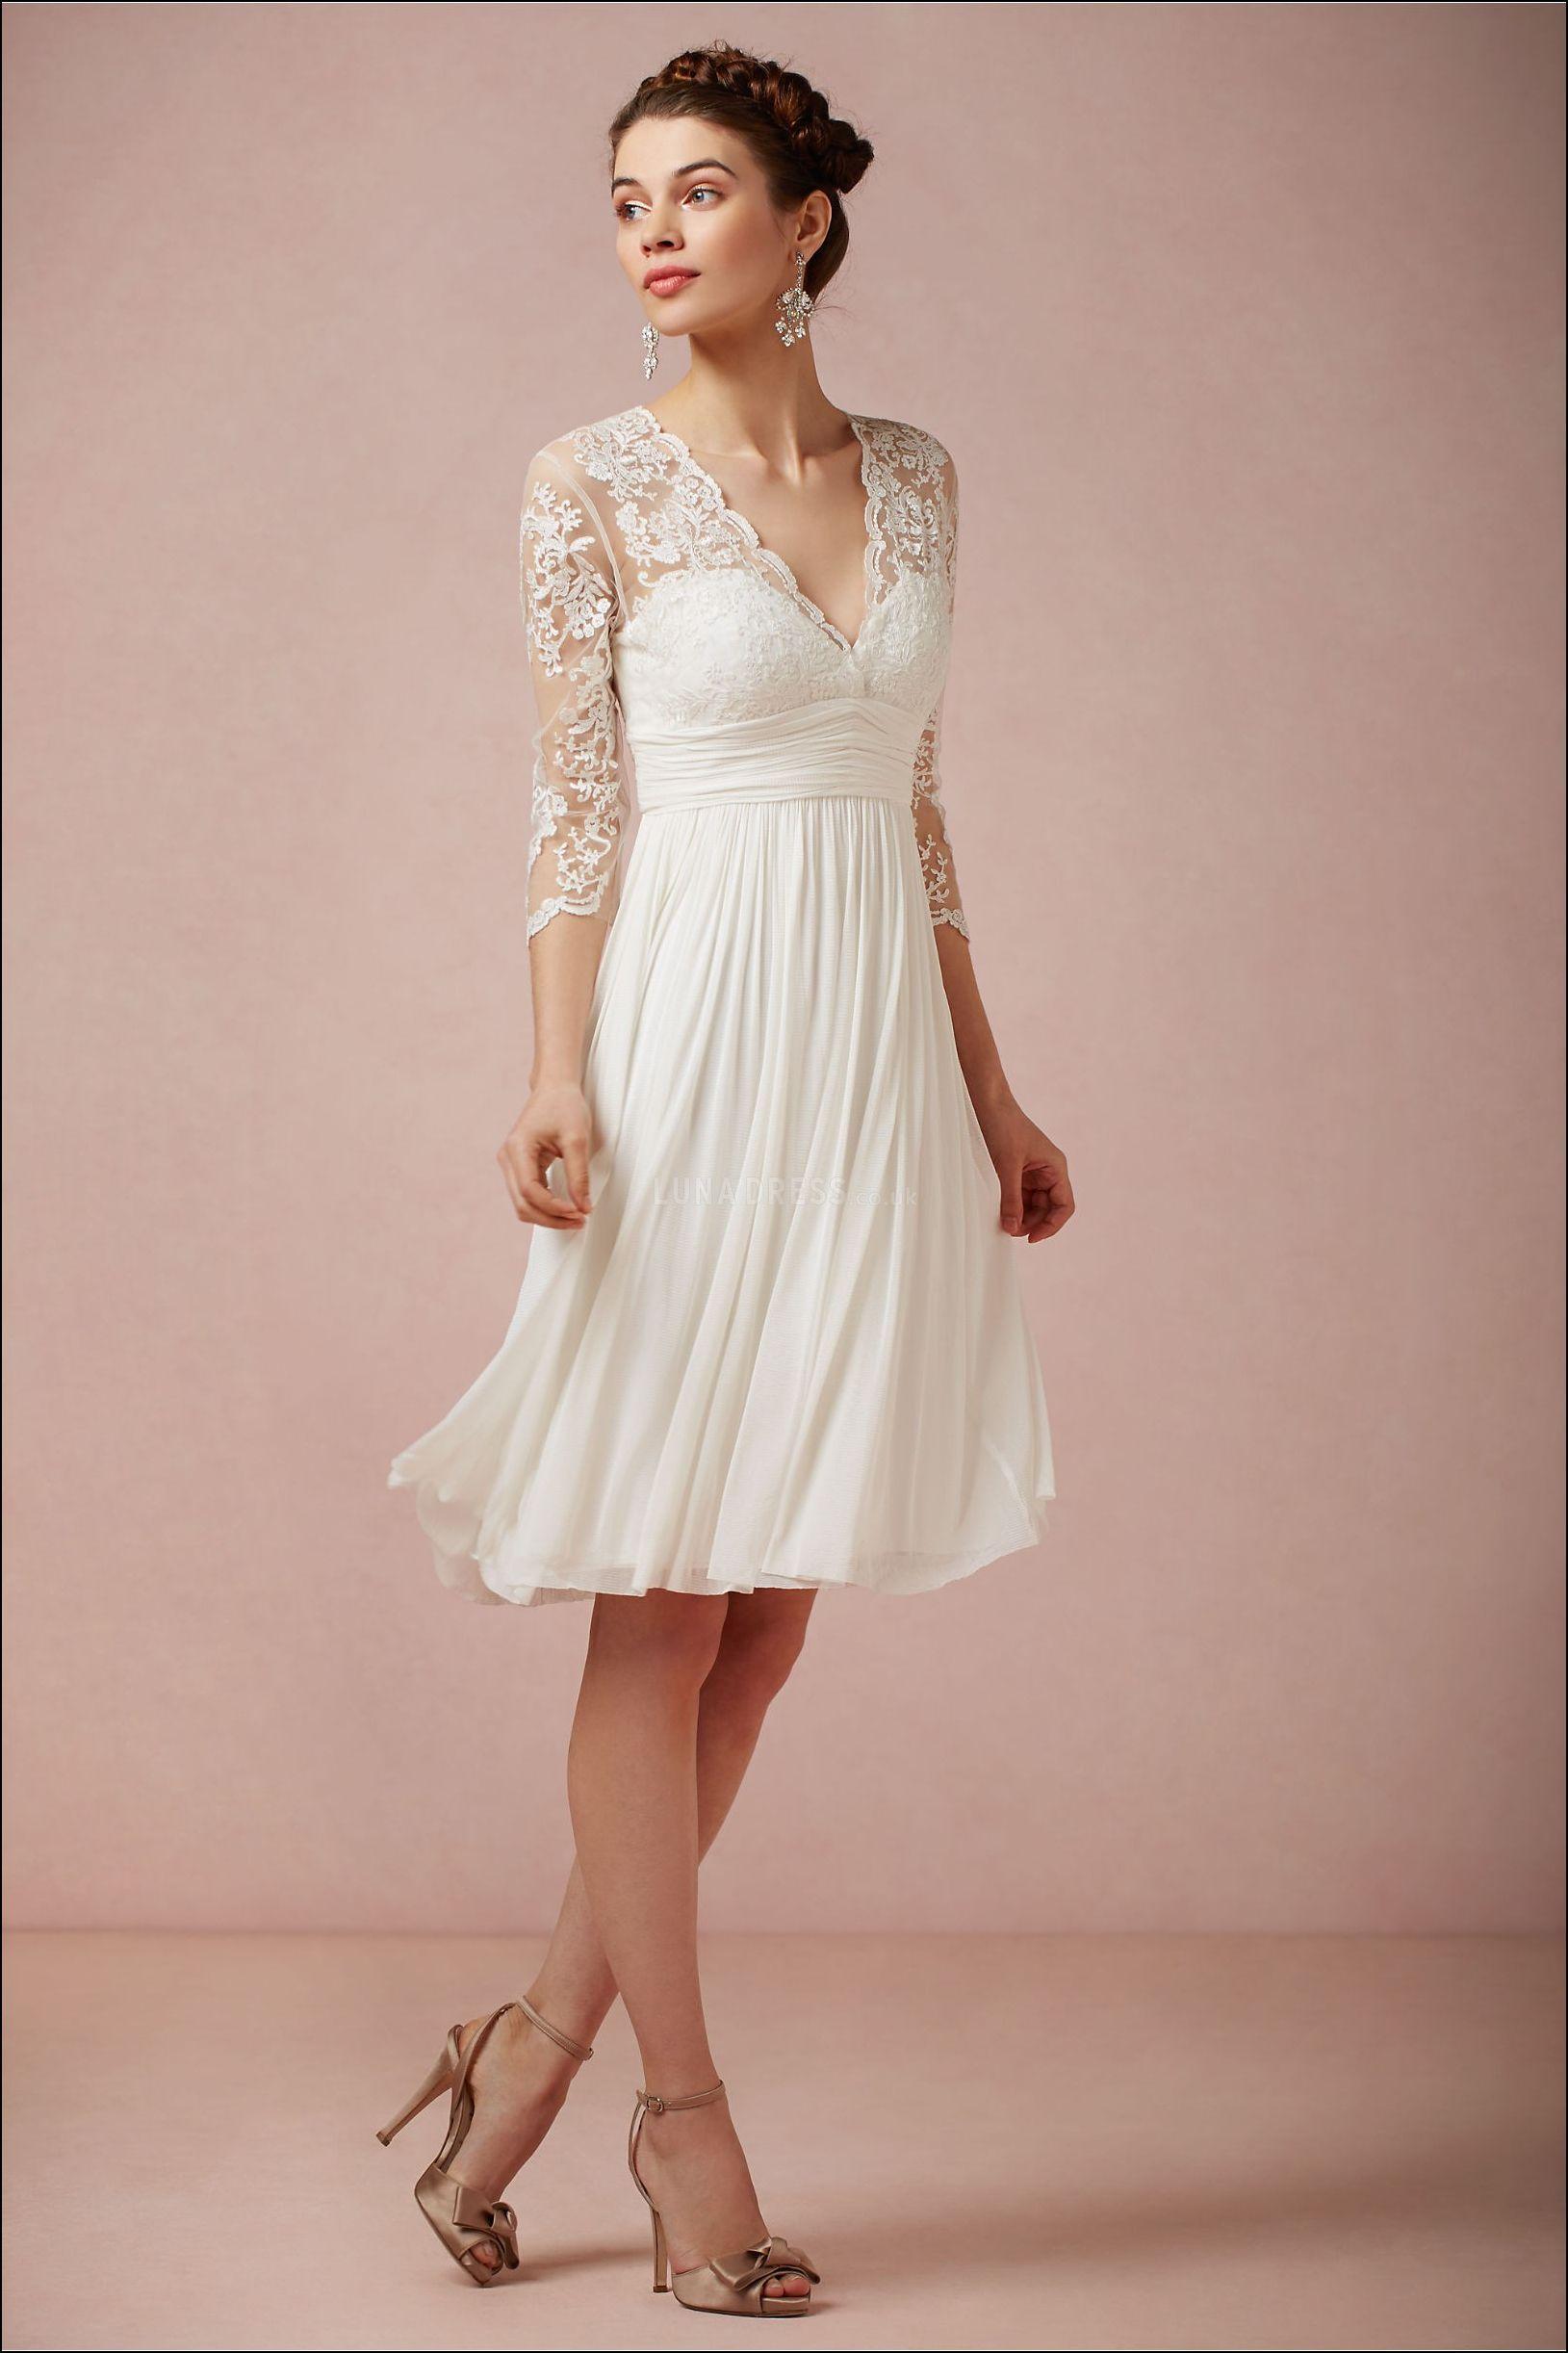 Unique Winter Wedding Dresses Under $1500 | Winter weddings, Wedding ...